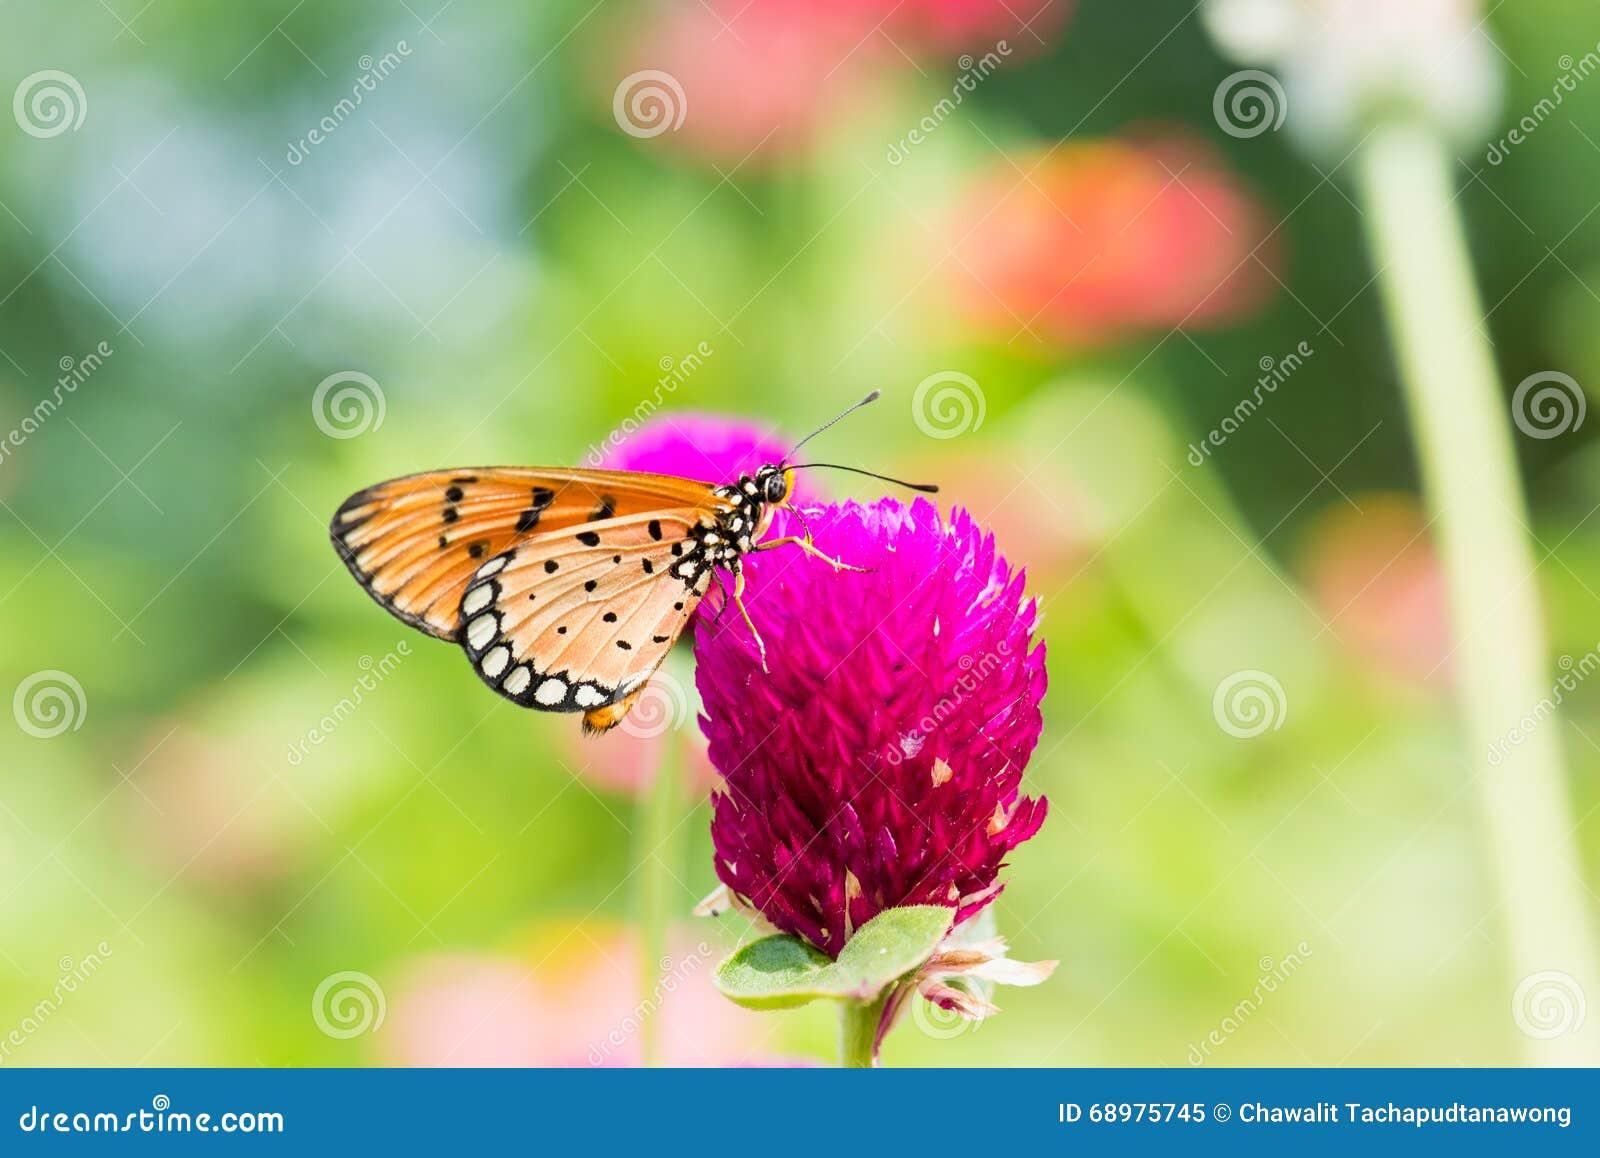 Pequeña mariposa anaranjada en la flor púrpura